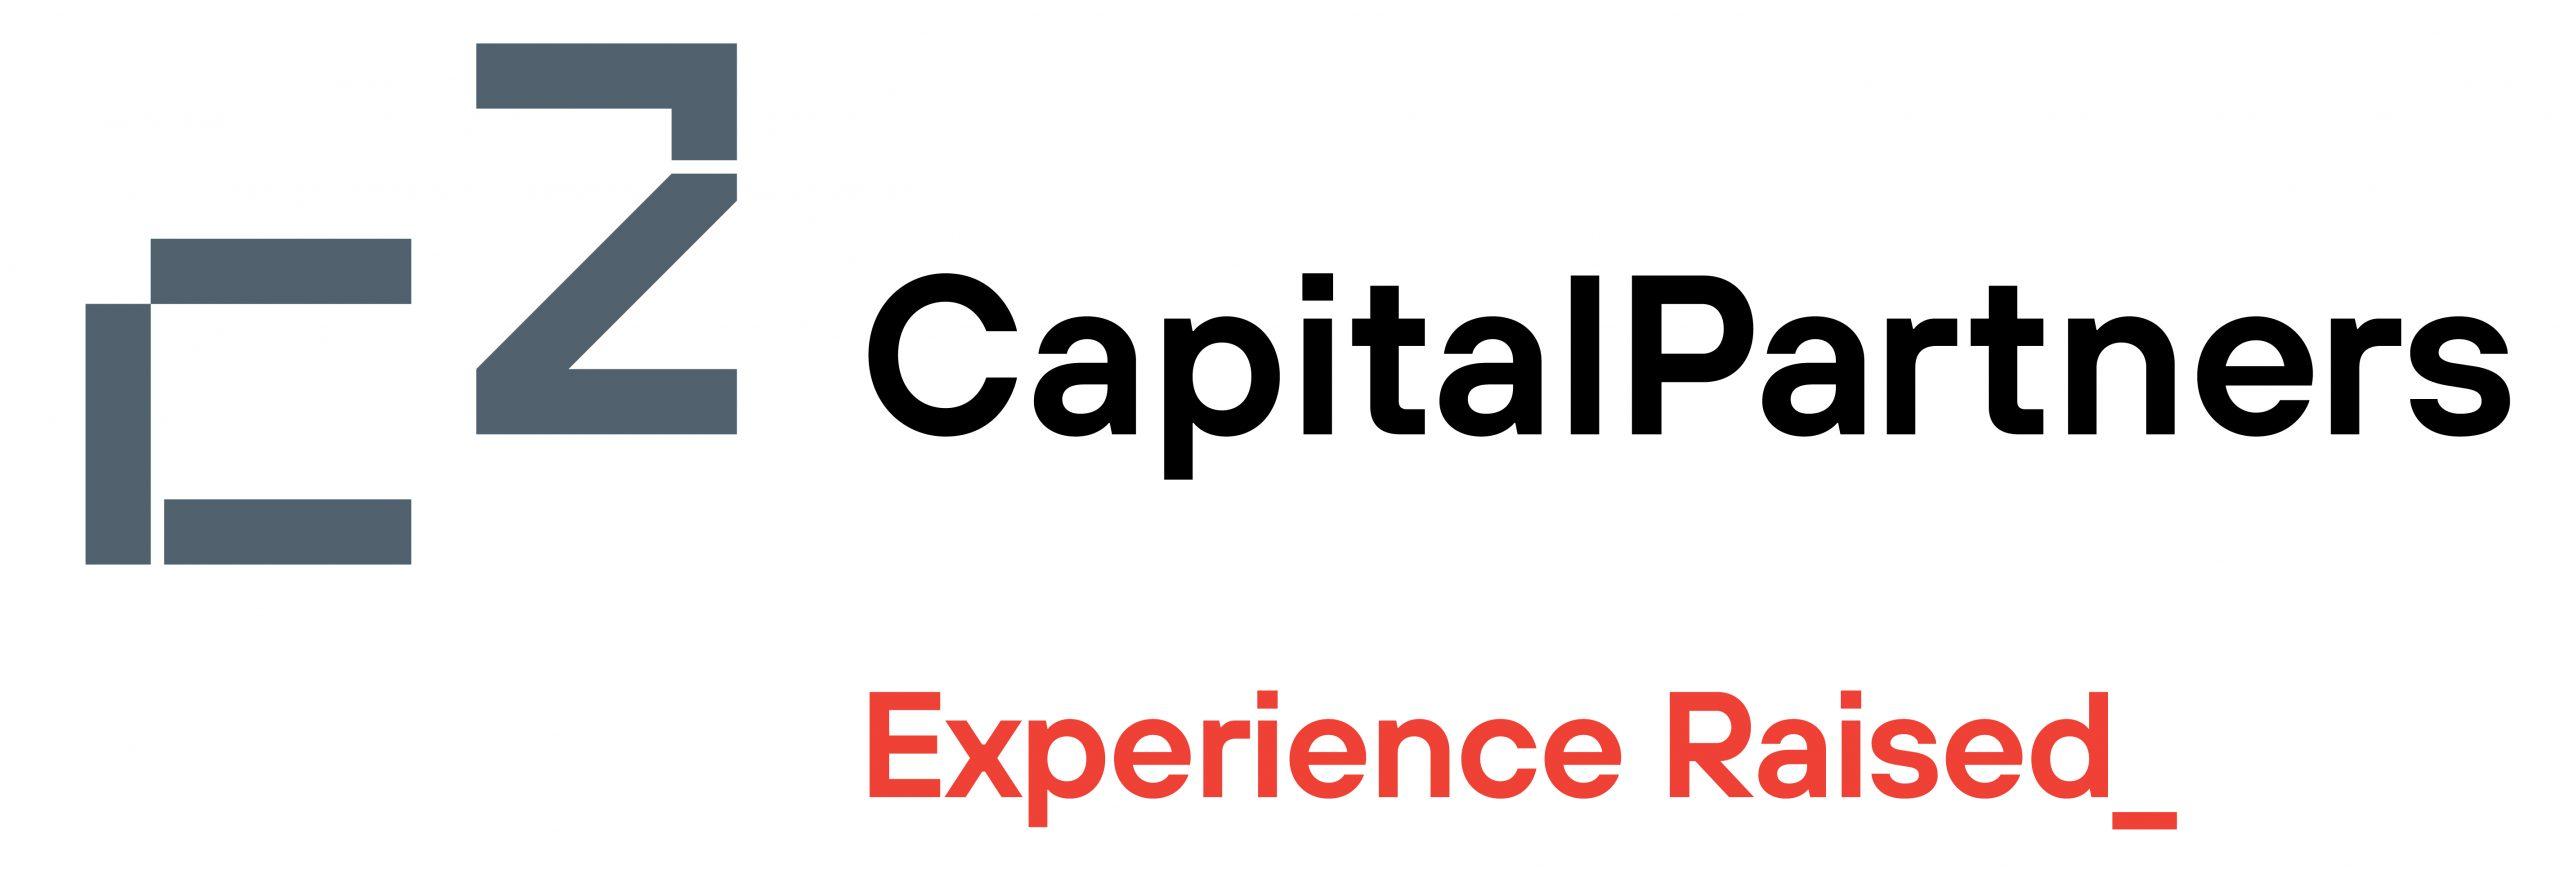 C2 Capital Partners